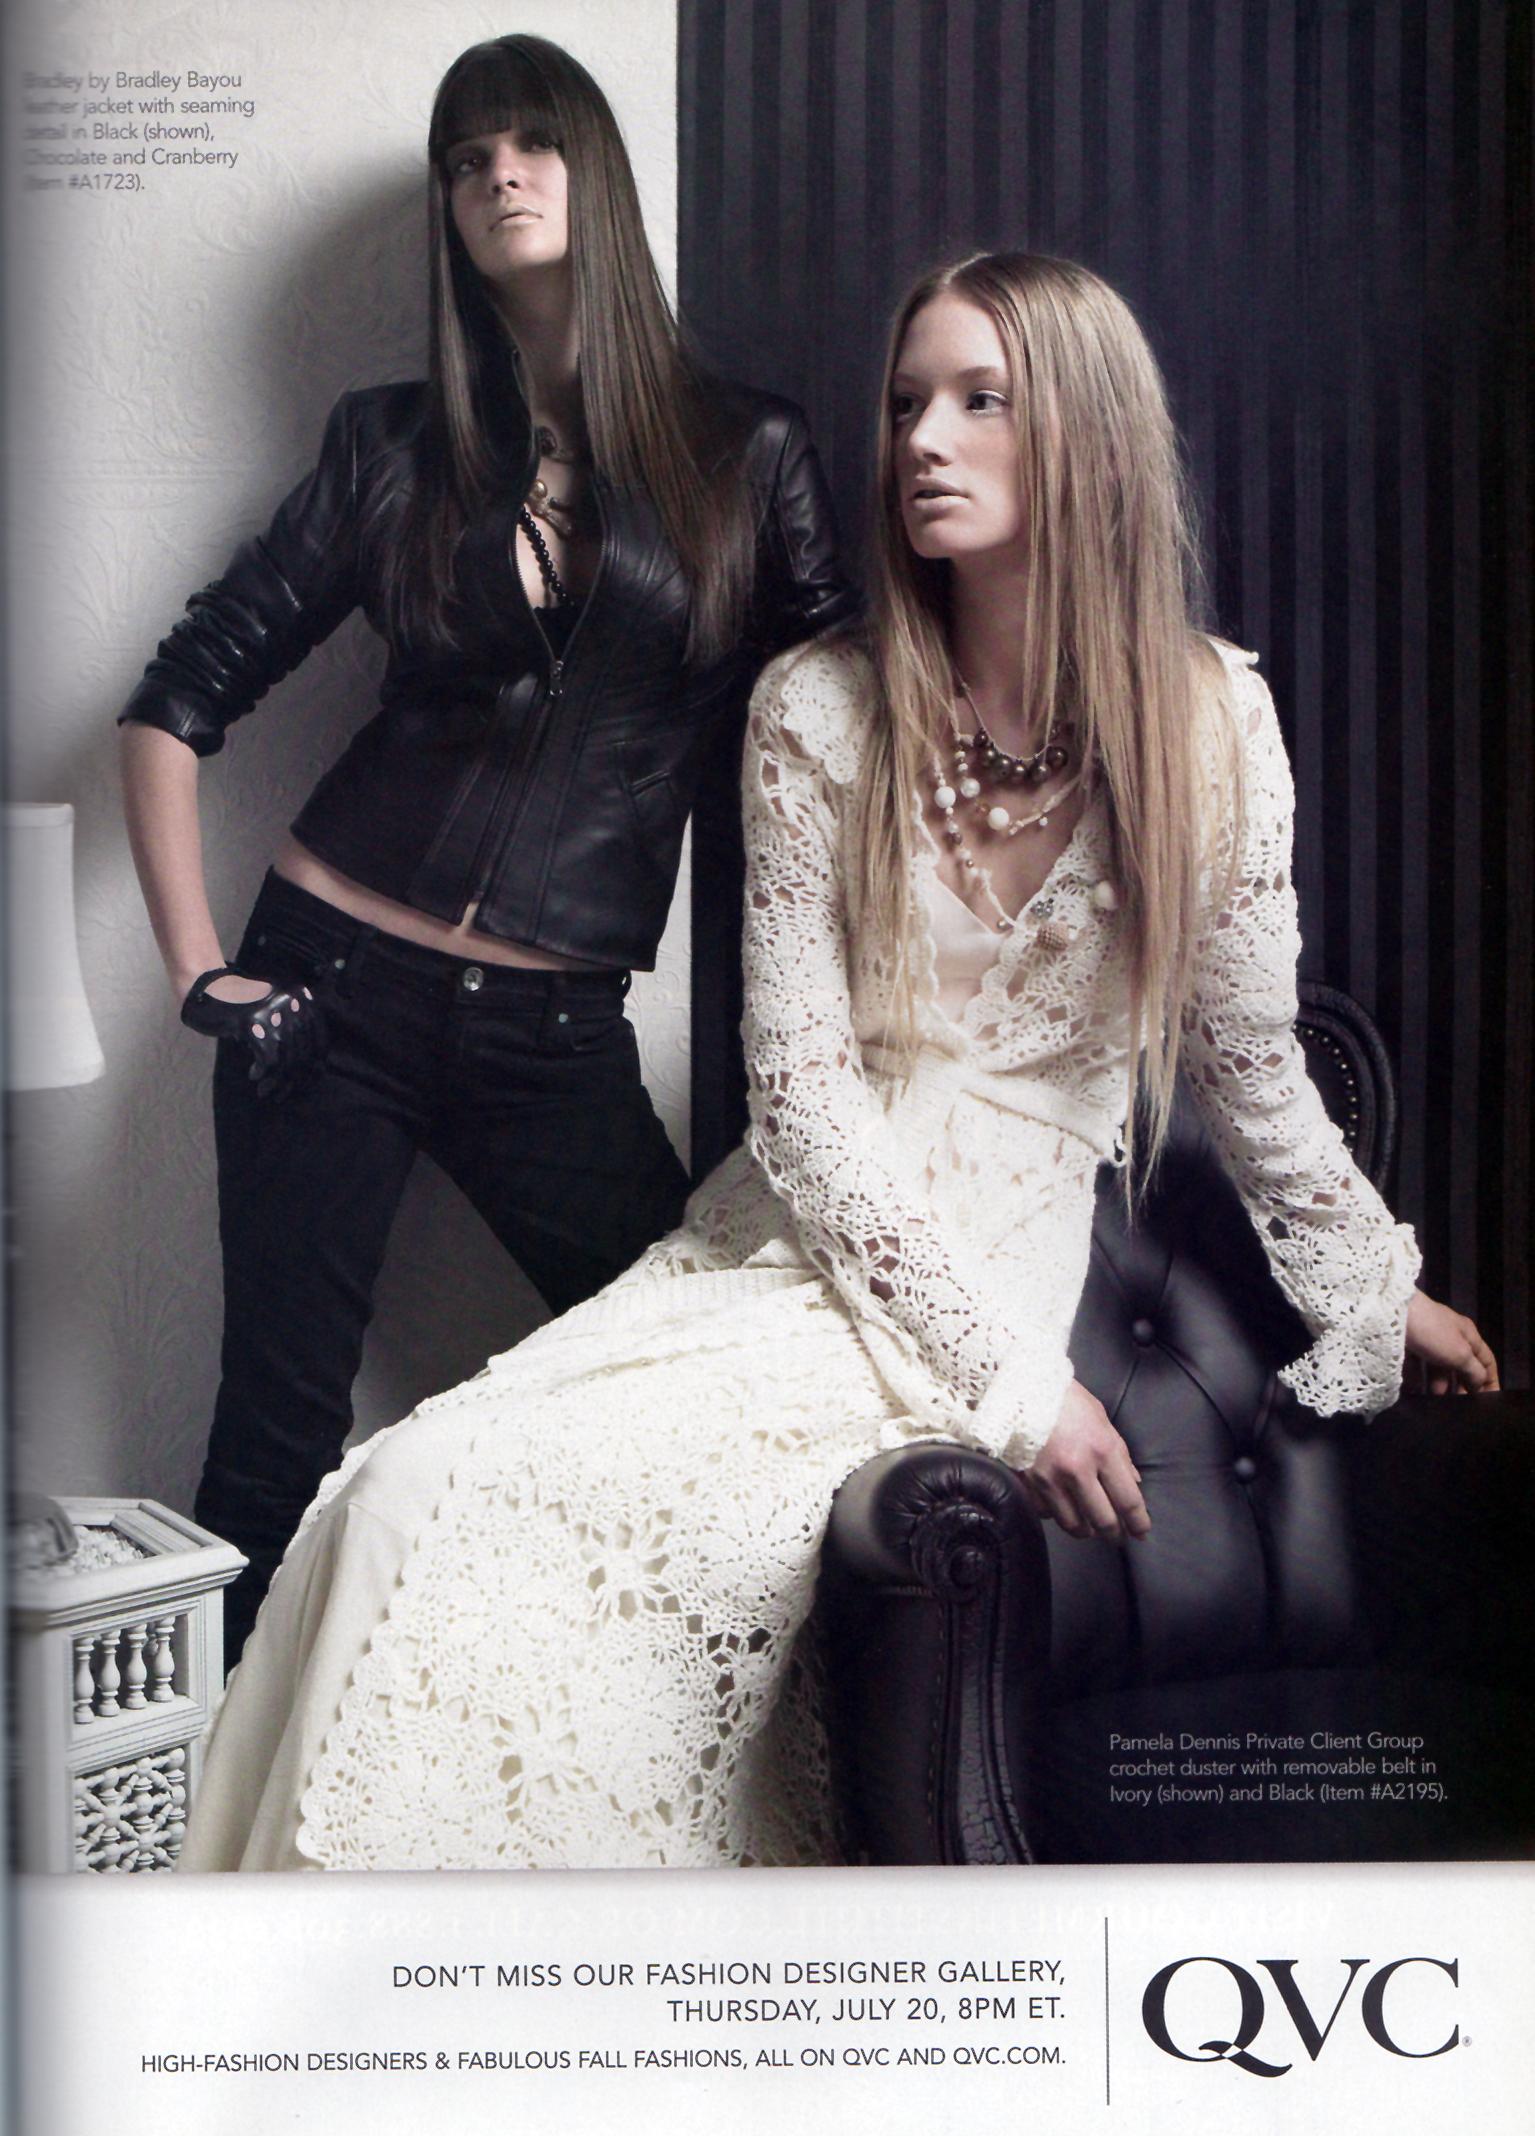 Vogue Ad